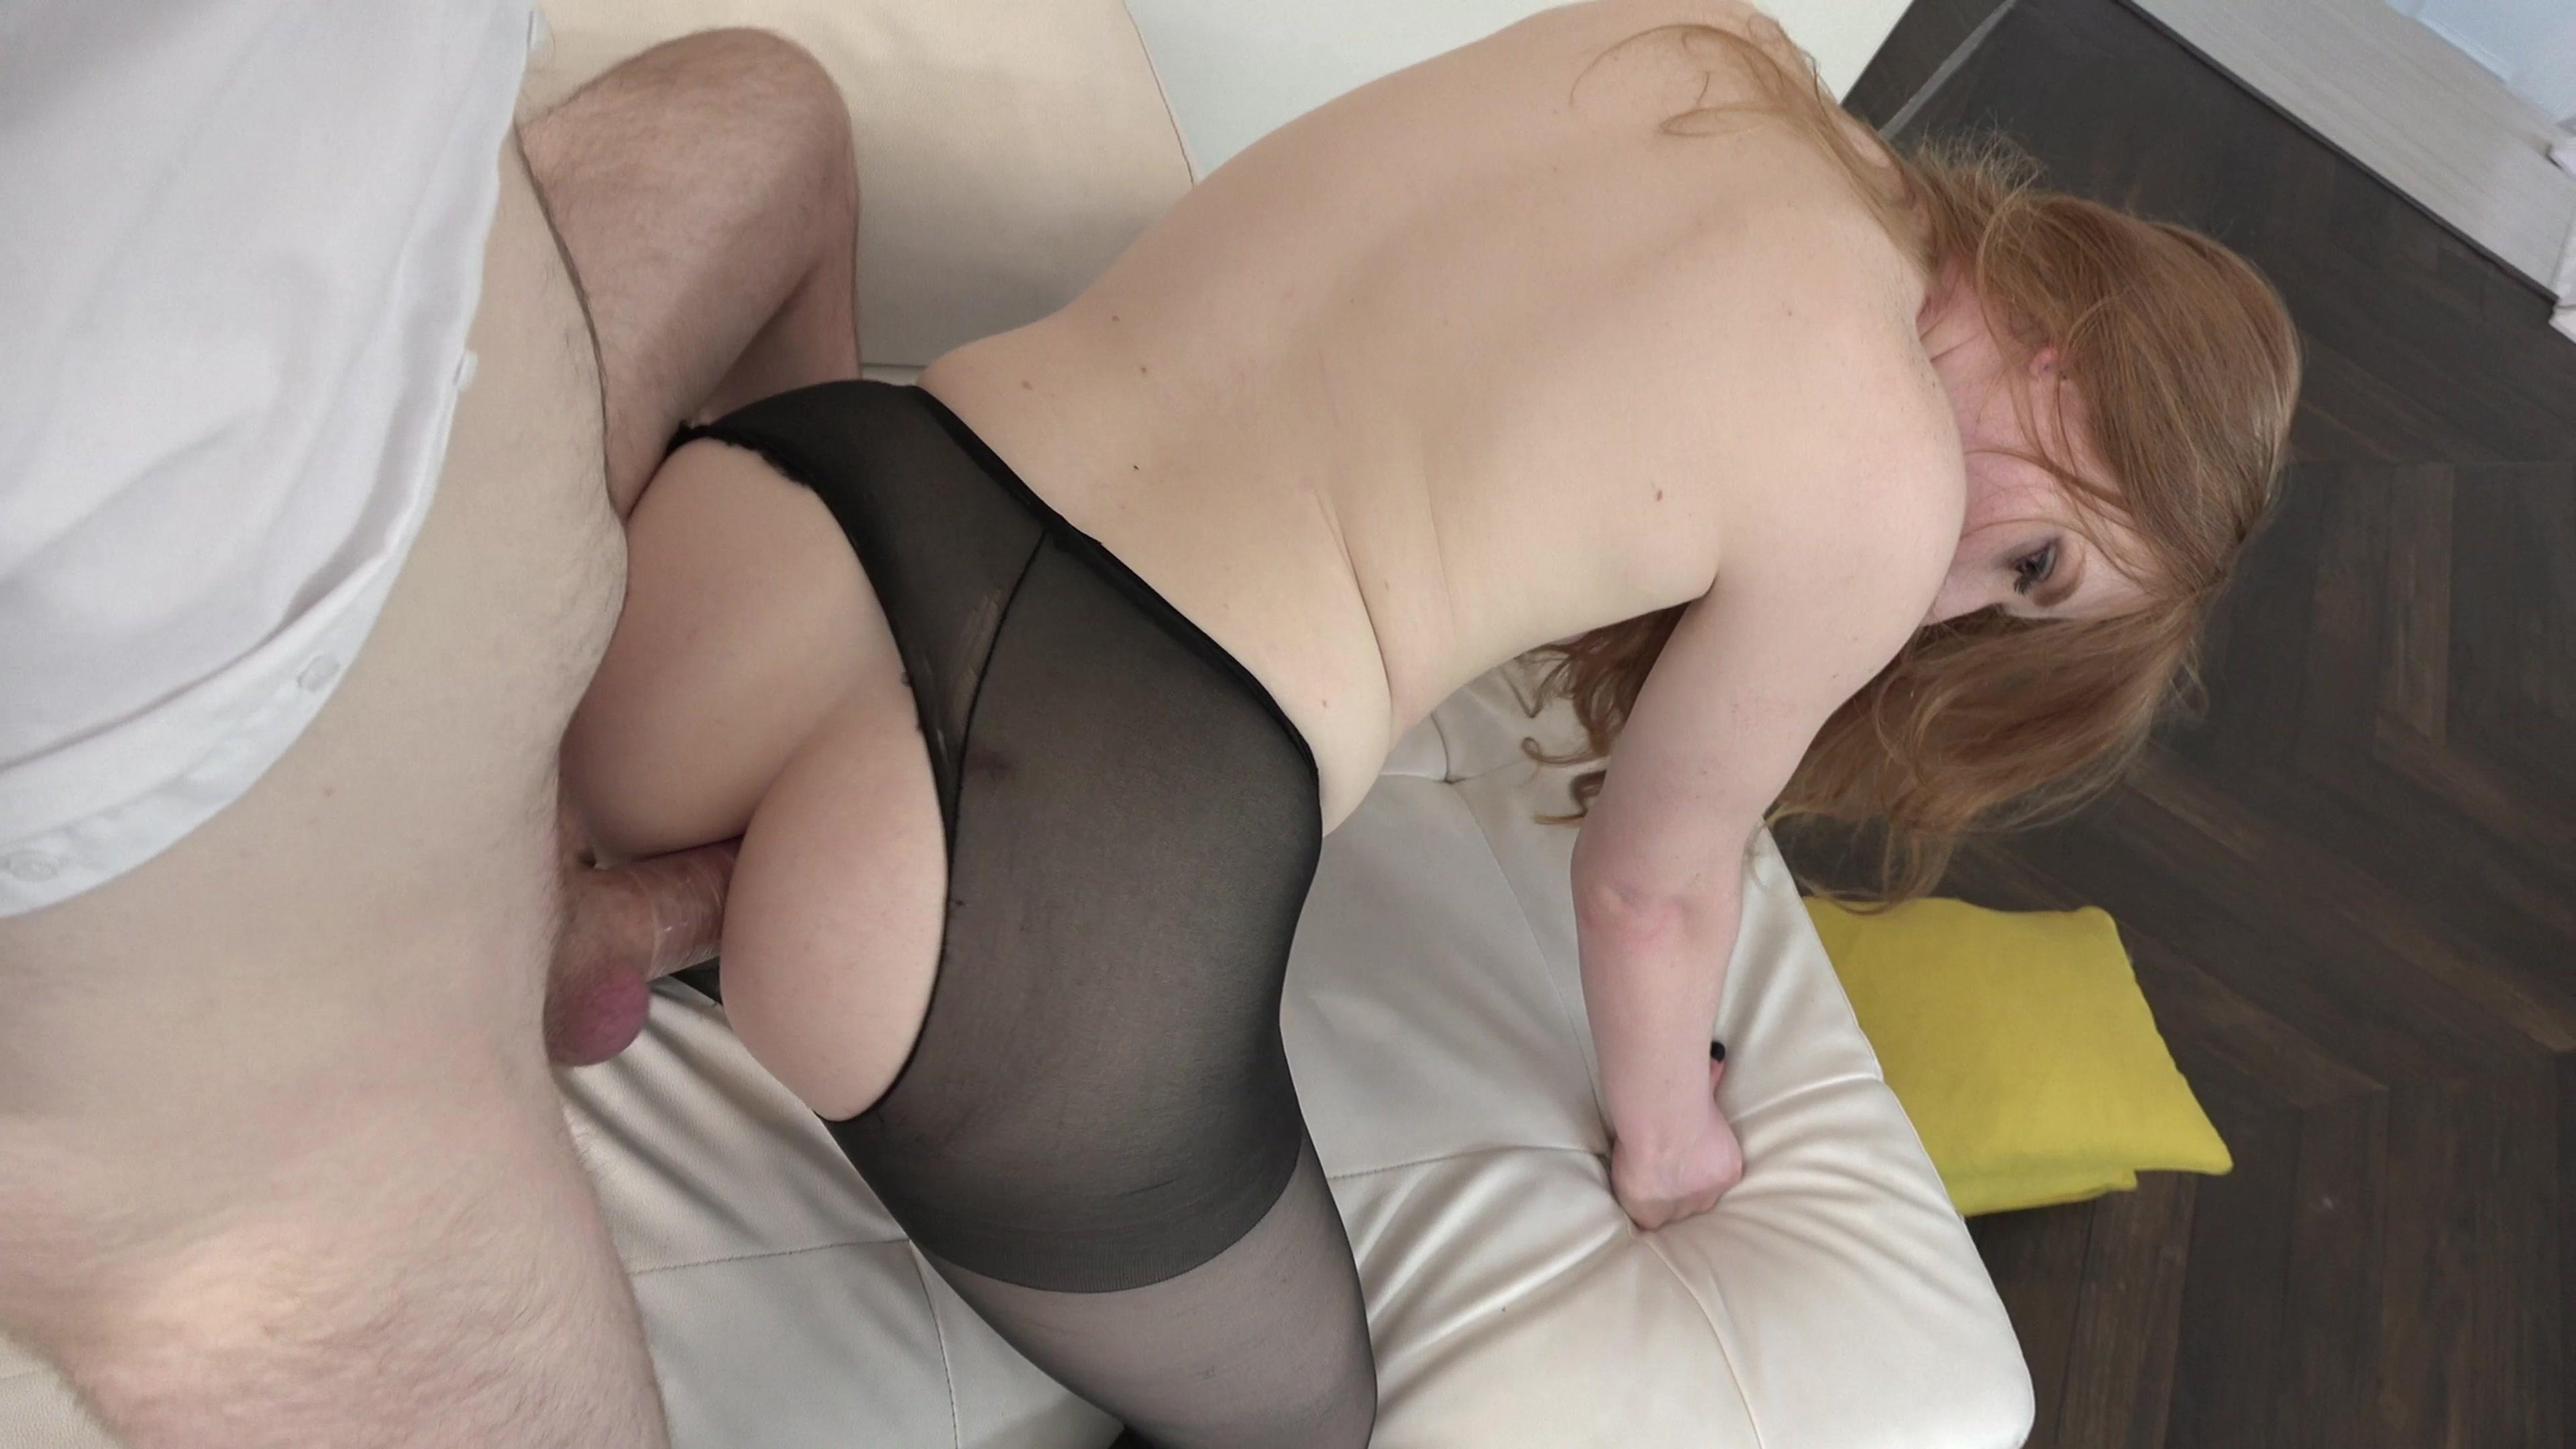 Pantyhose sex ride women